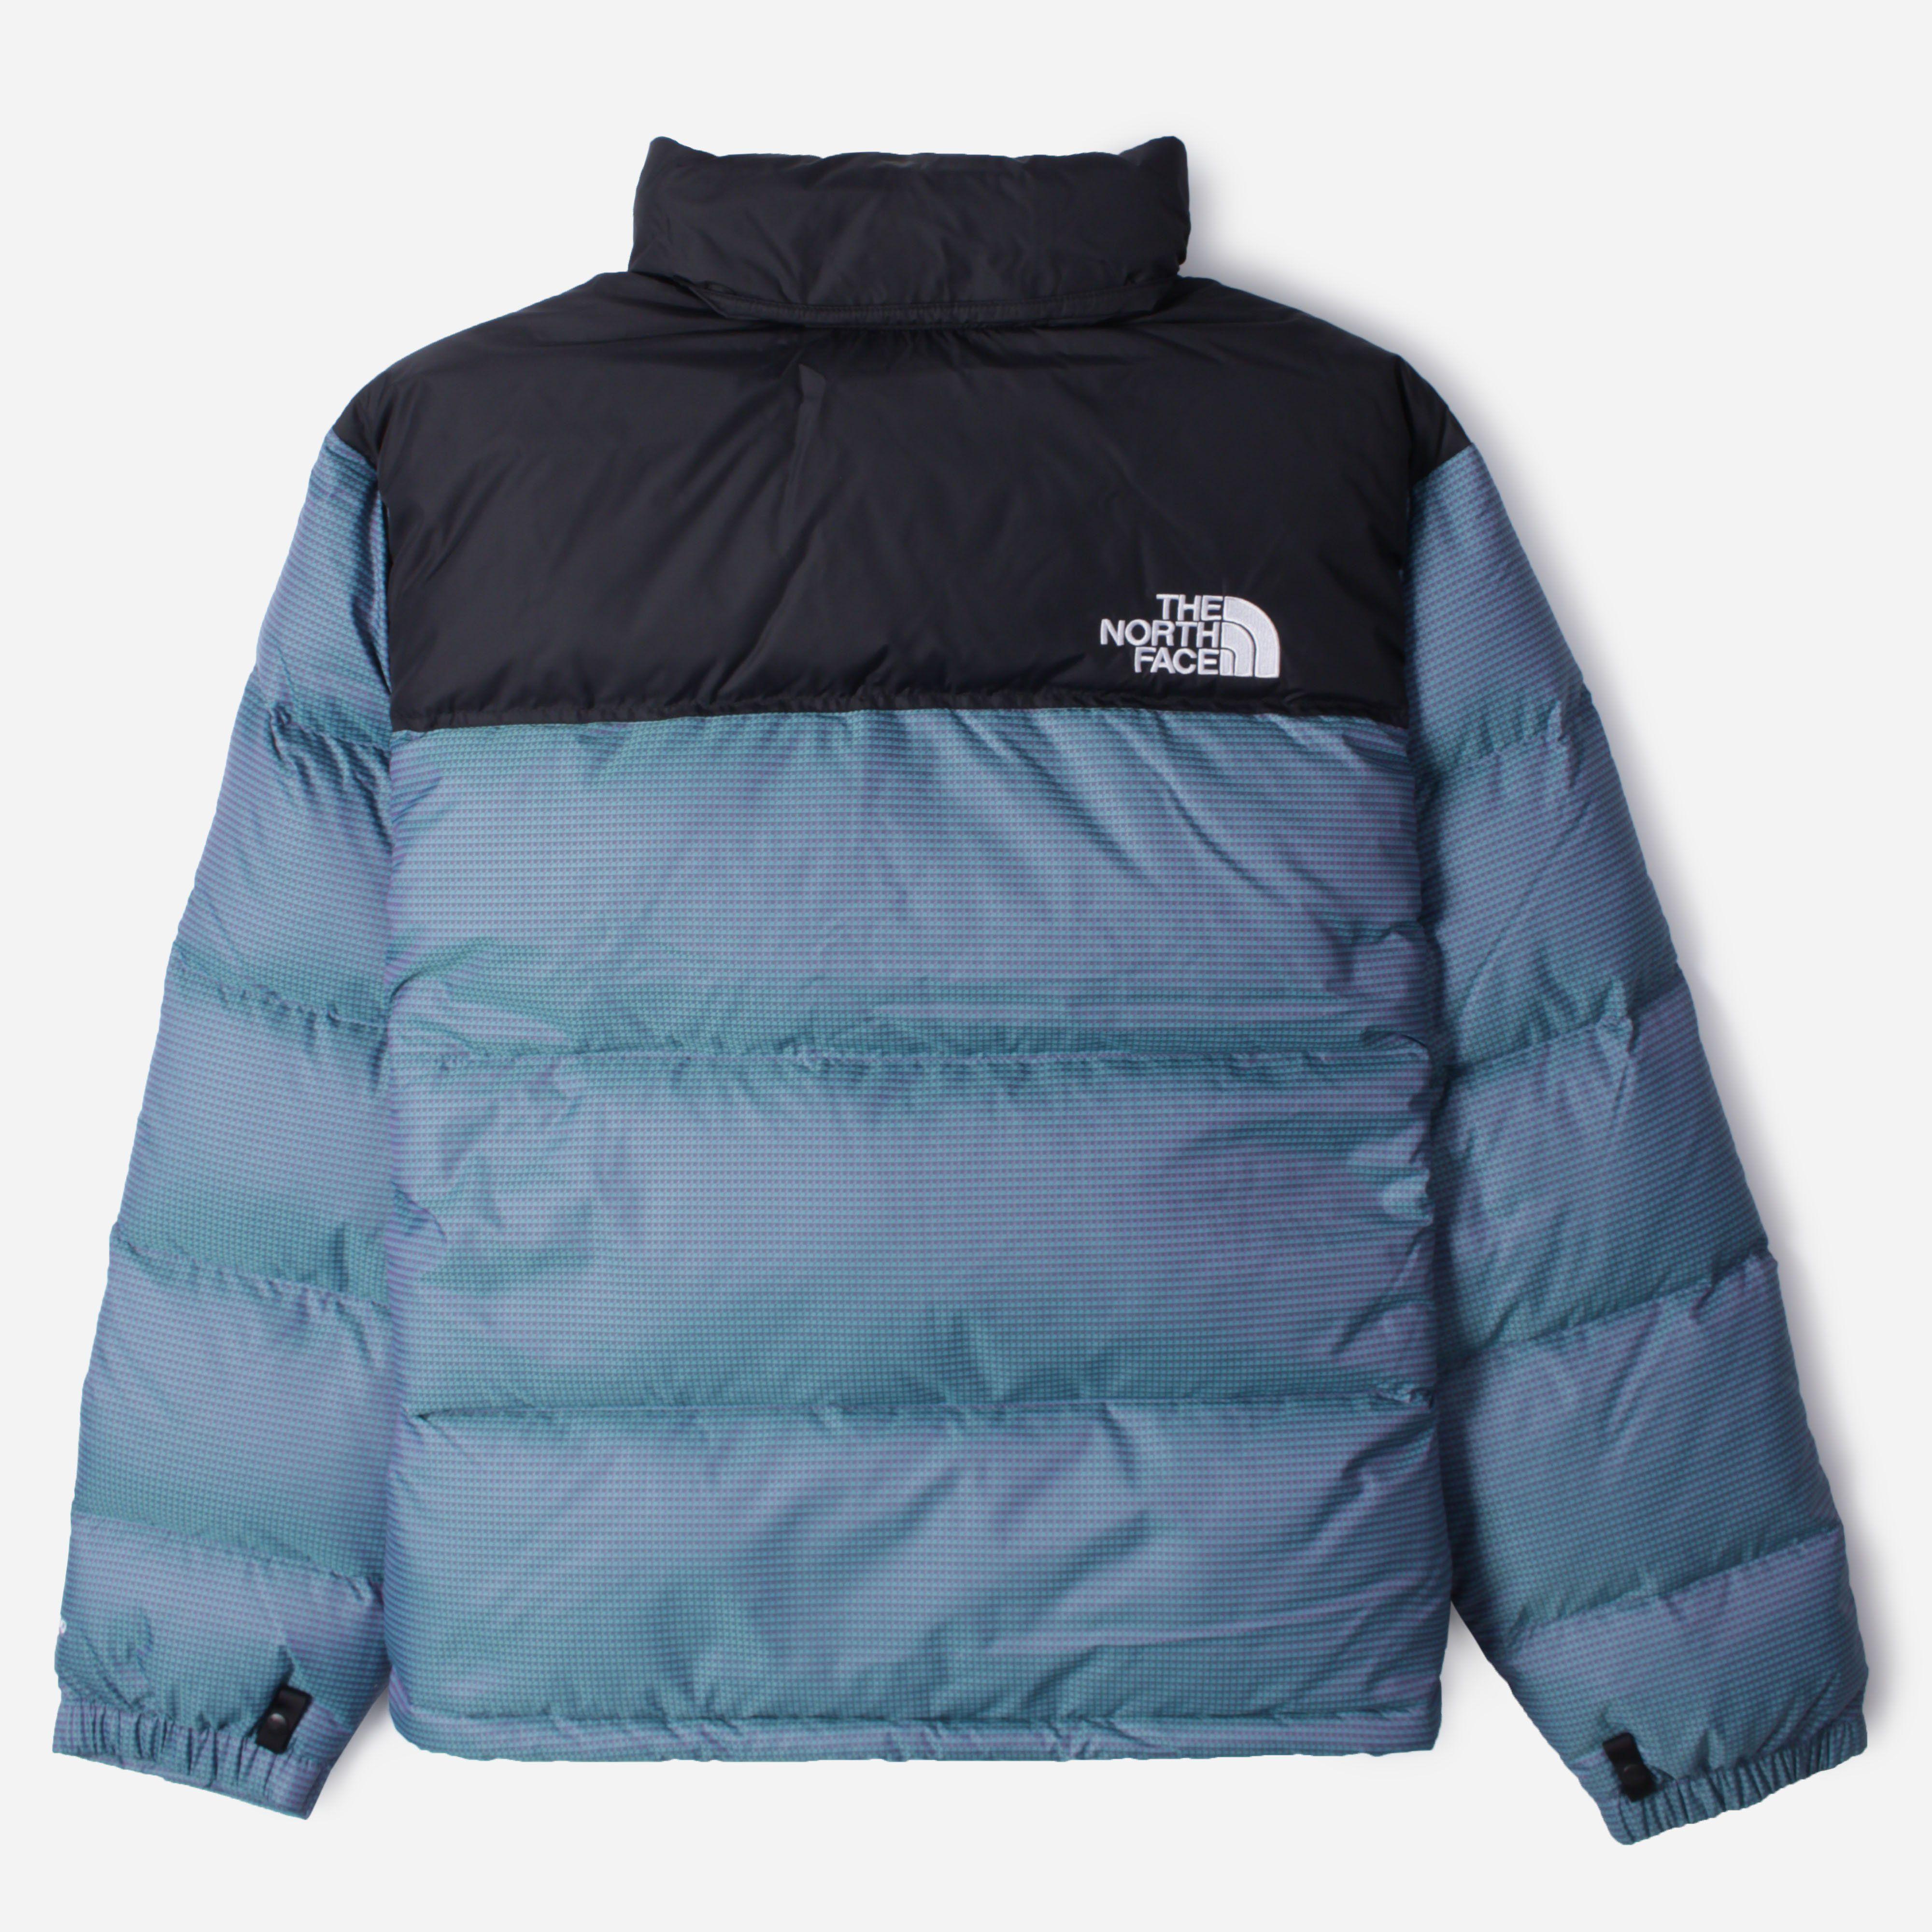 The North Face 1996 Retro Seasonal Iridescent Nuptse Jacket